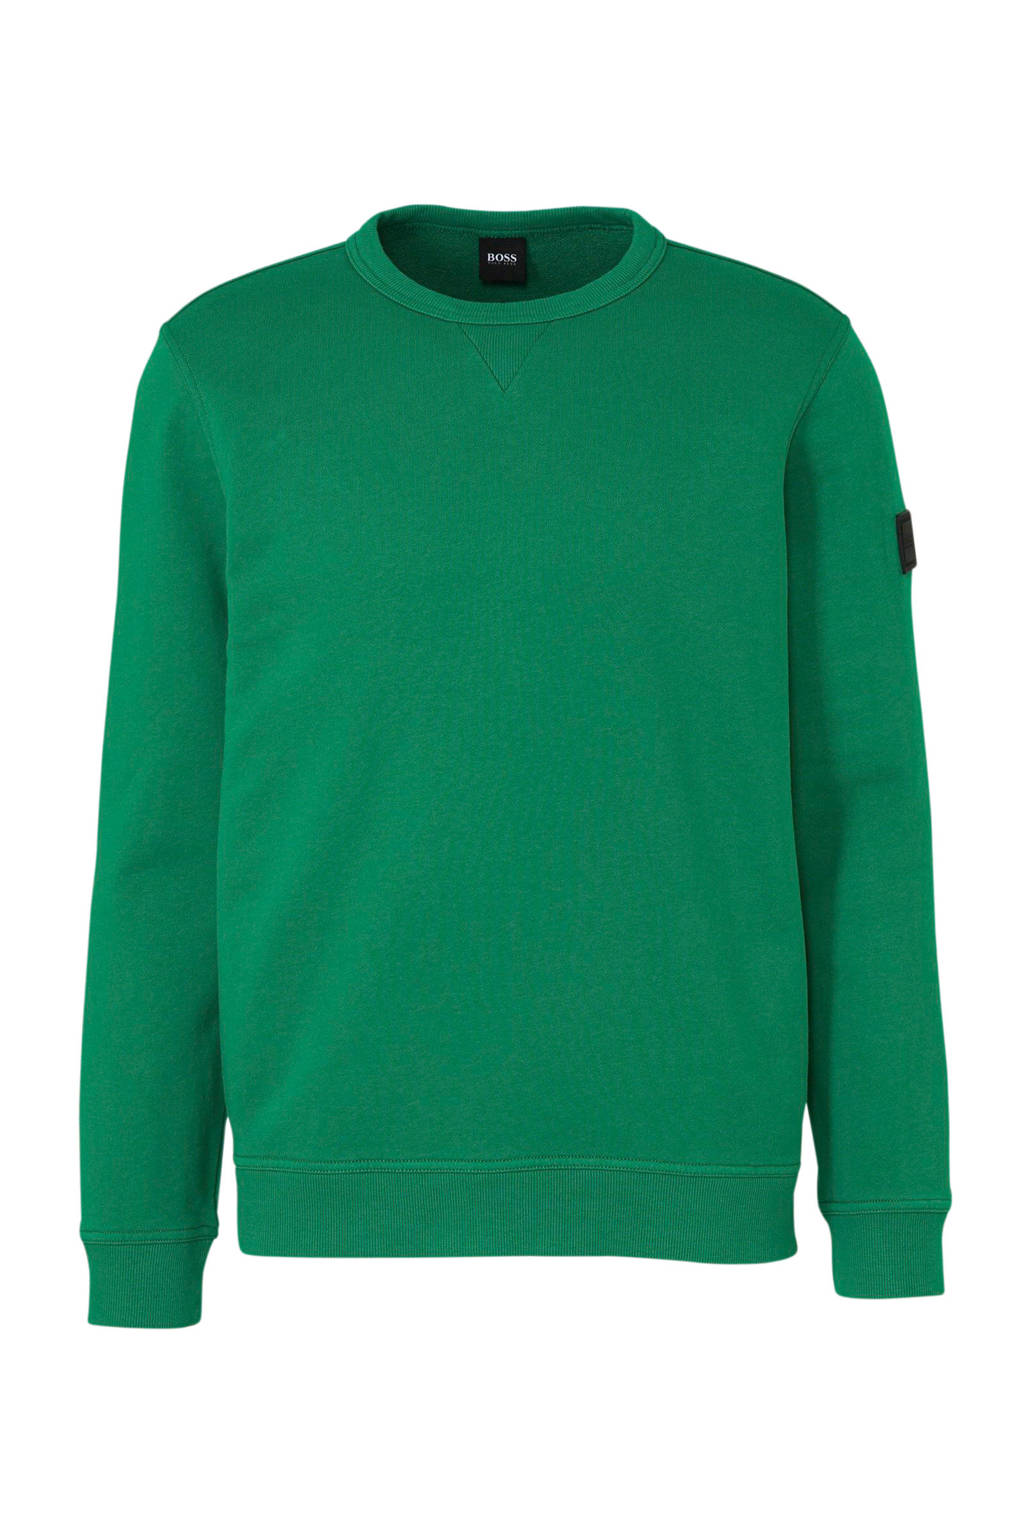 BOSS Casual sweater groen, Groen